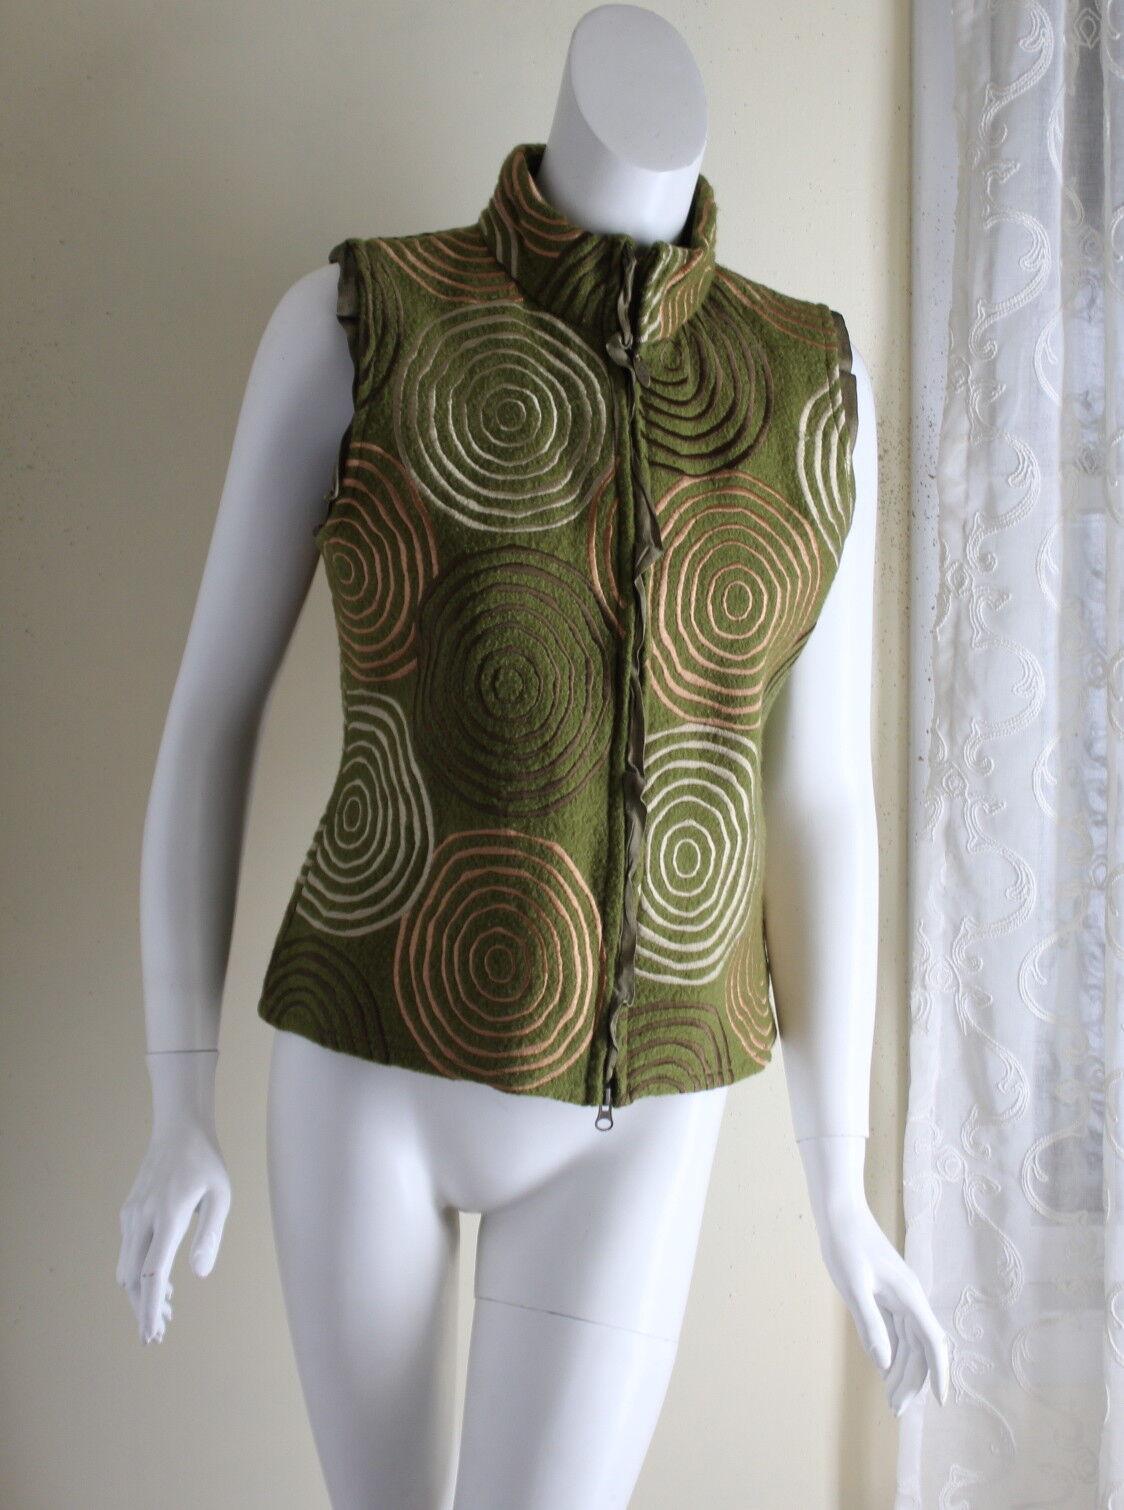 Covelo-Talla M arte excepcional verde de lana hervida  Chaqueta Chaleco Concéntrico Funky Mod  Envío 100% gratuito